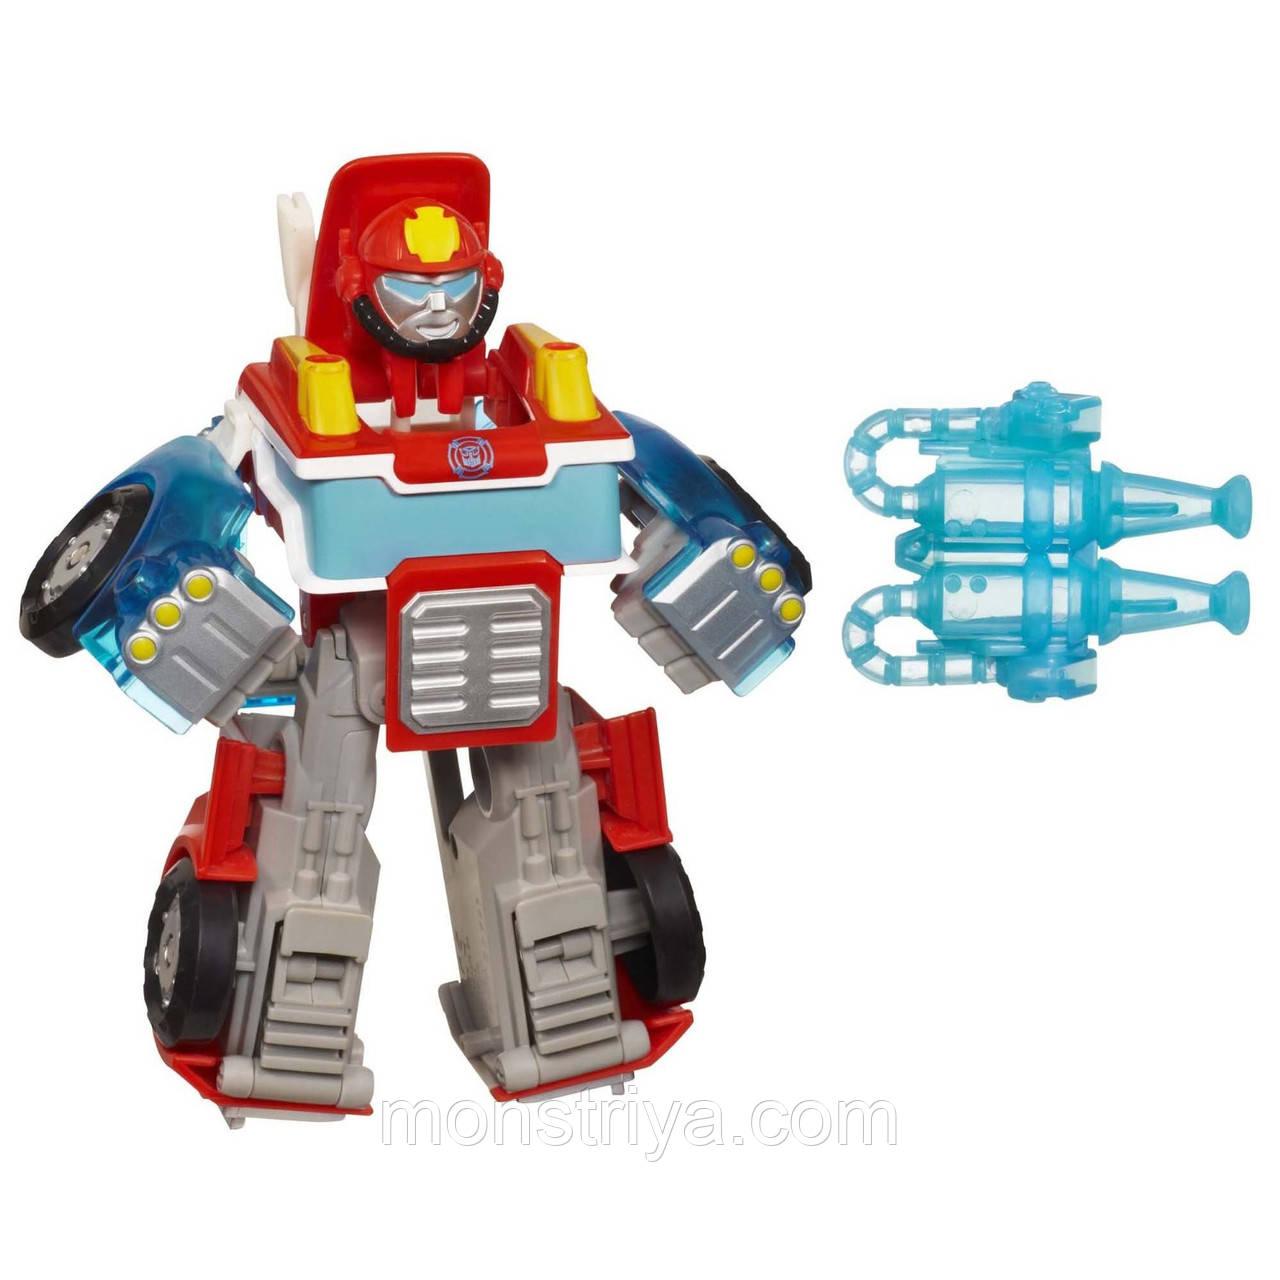 Хитвейв Боты Спасатели Hasbro Transformers, фото 1